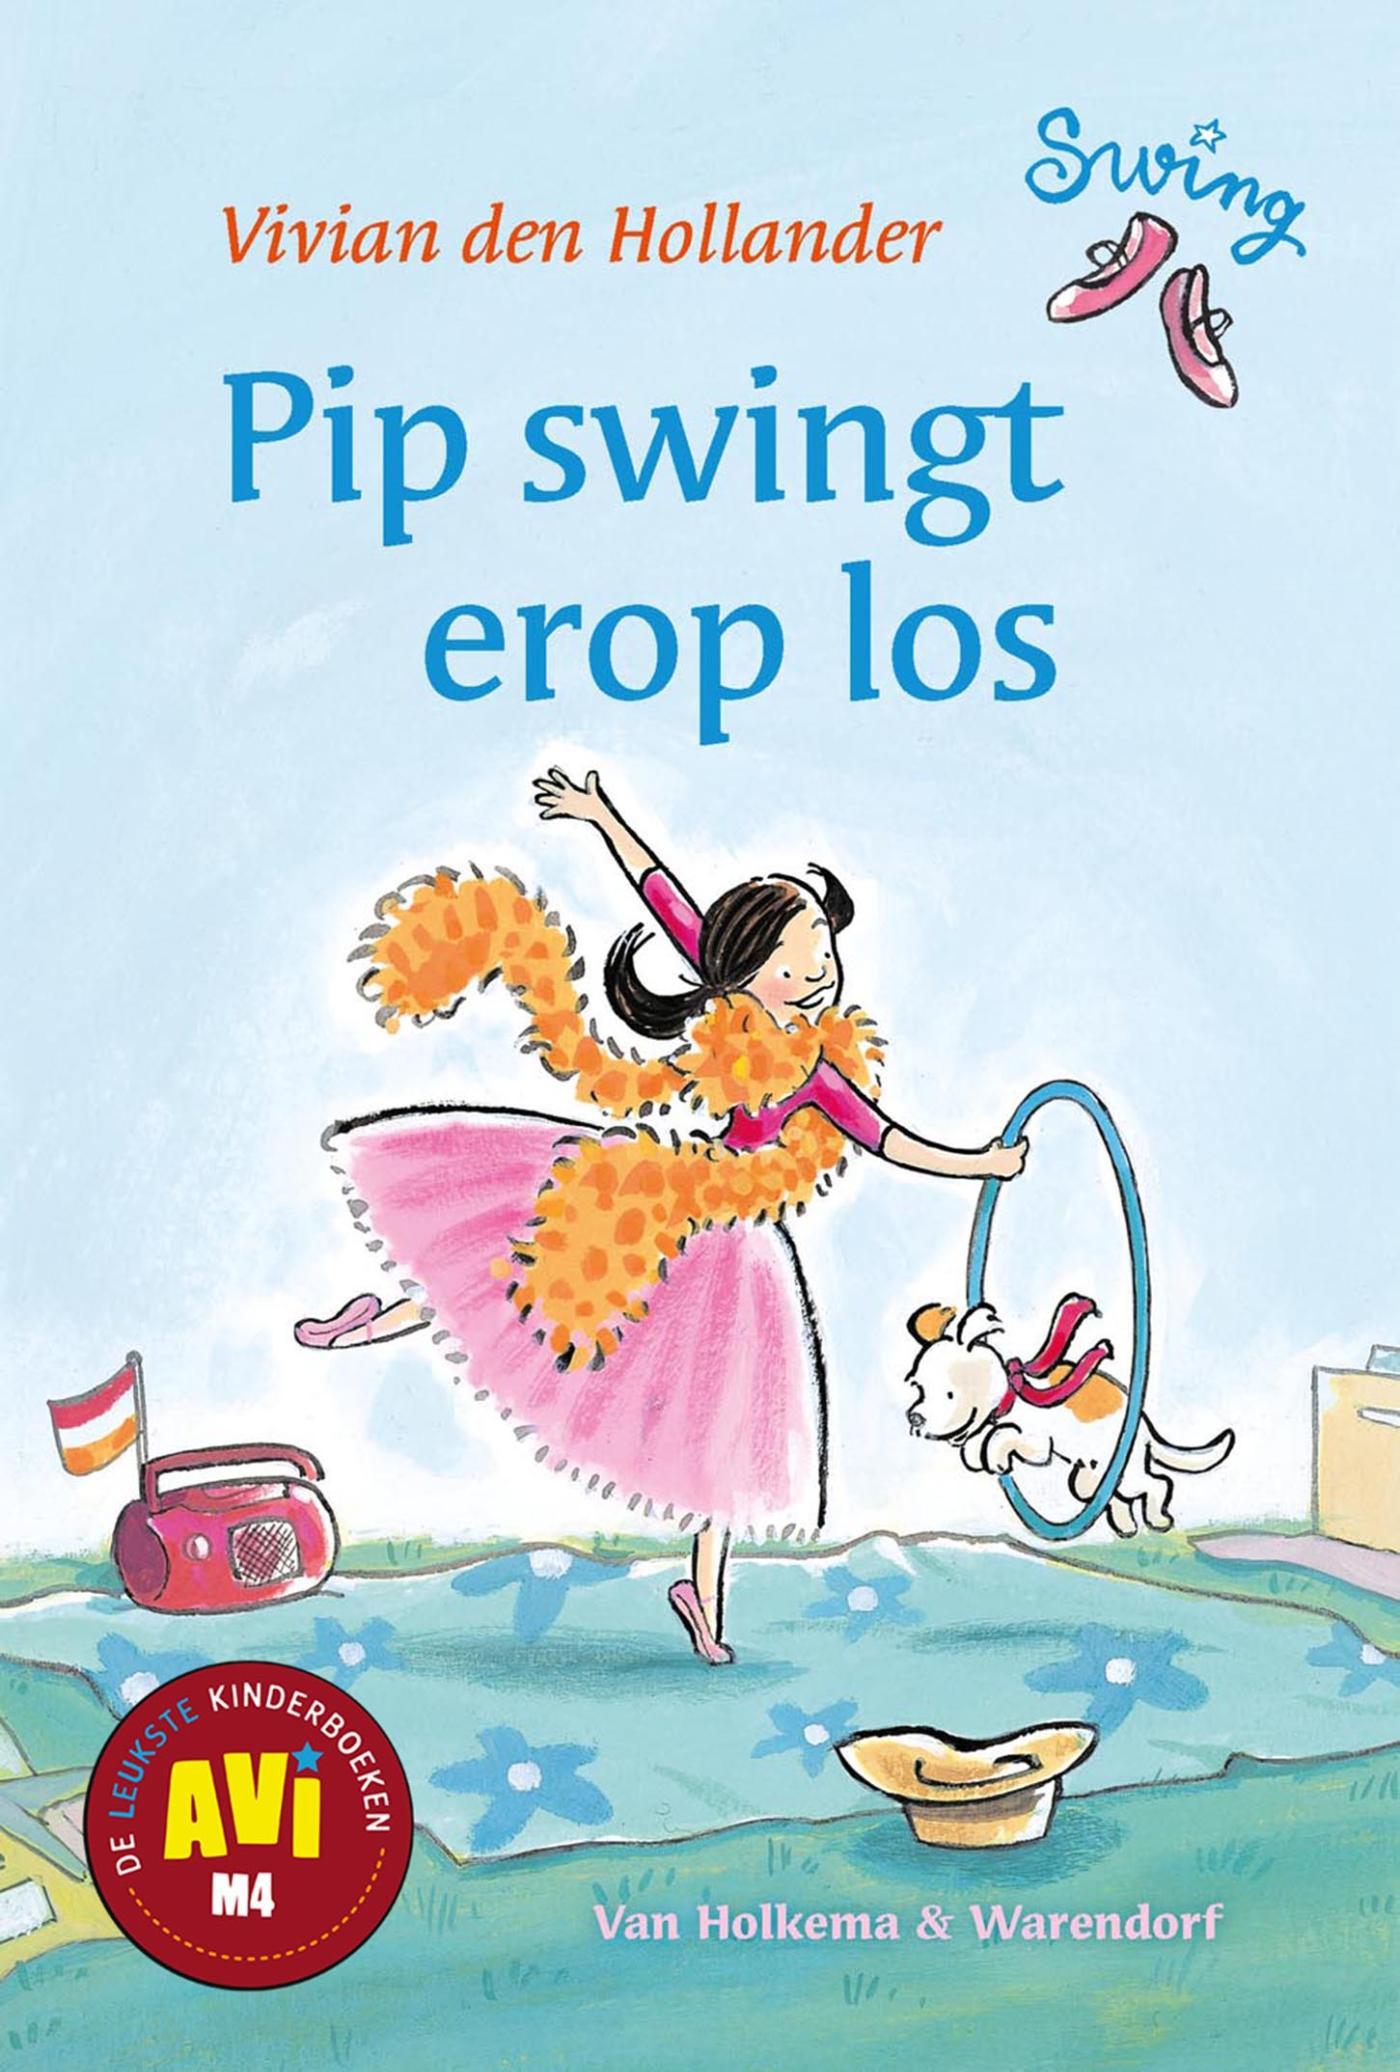 Pip swingt er op los